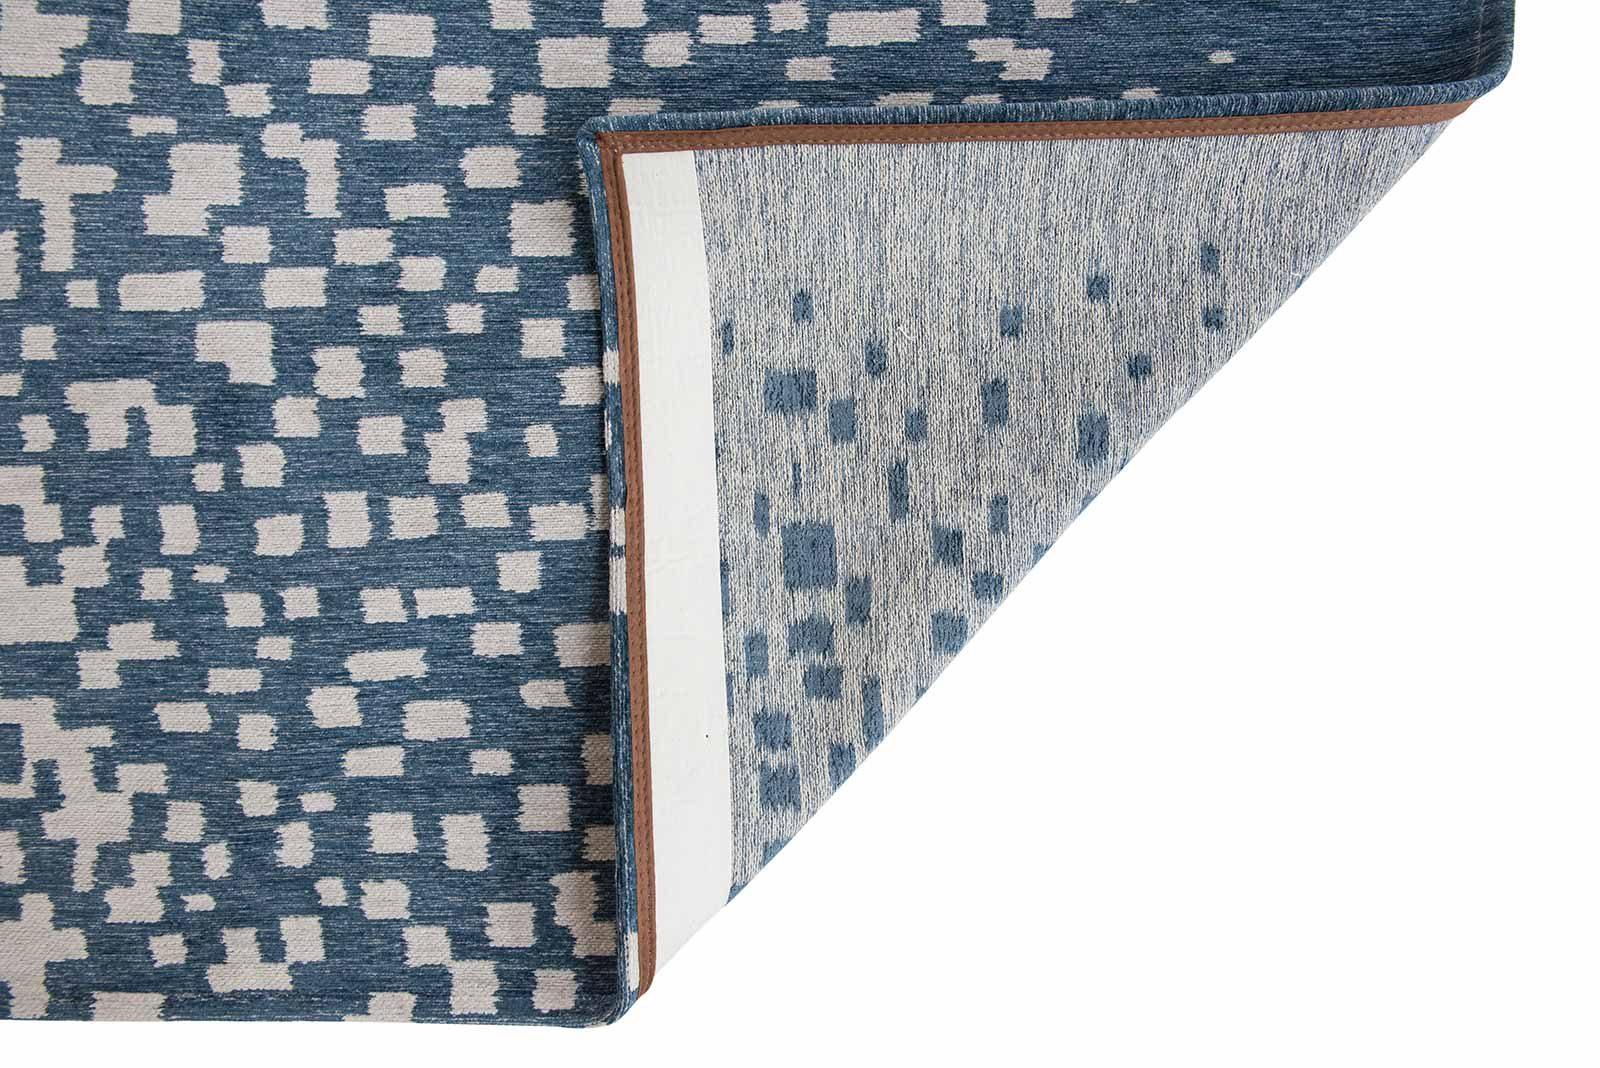 Louis De Poortere rugs Villa Nova LX 8777 Freyr Indigo back